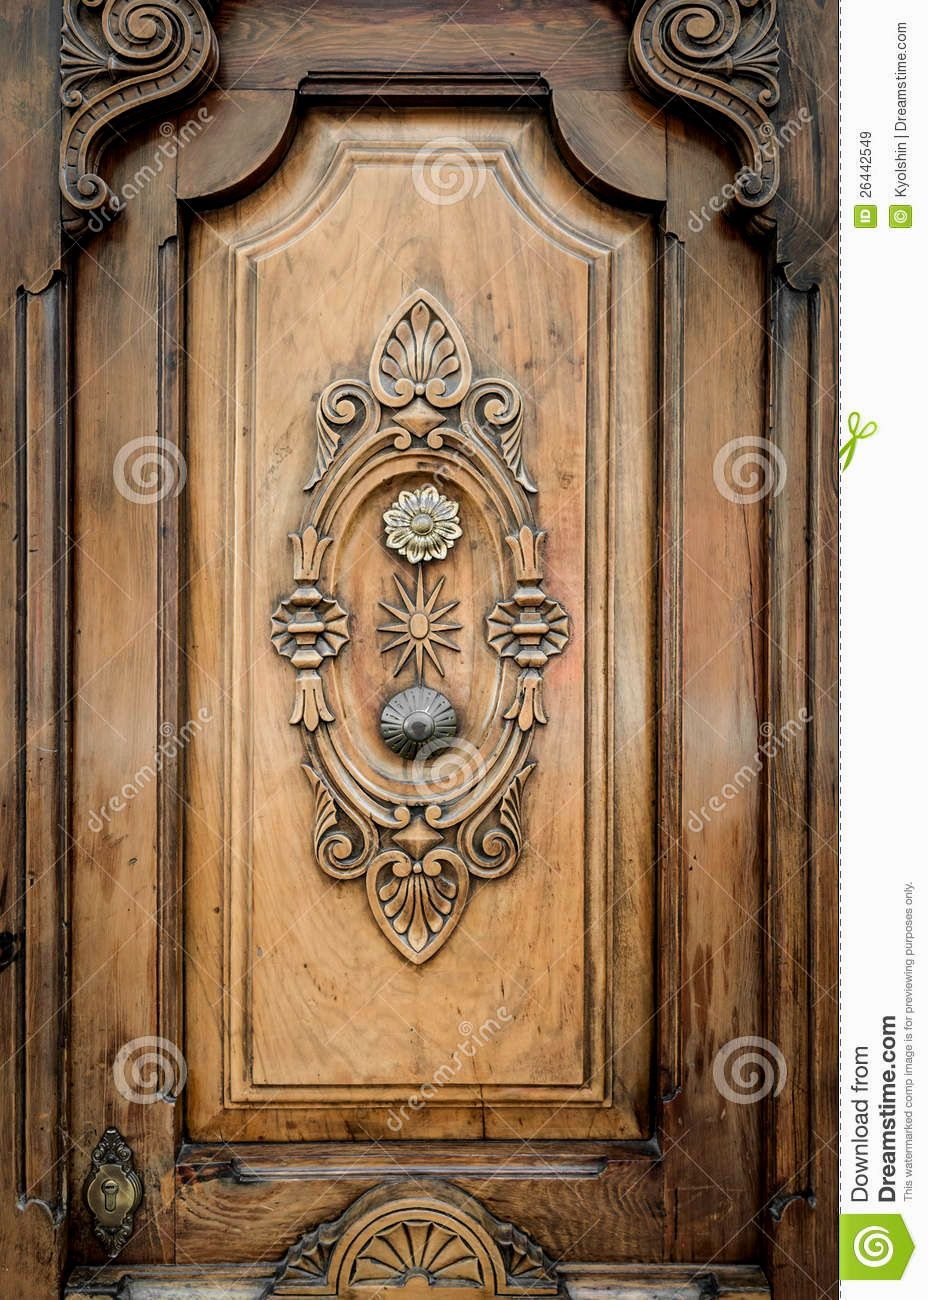 antique main door designs - Antique Main Door Designs Unique Pinterest Main Door Design